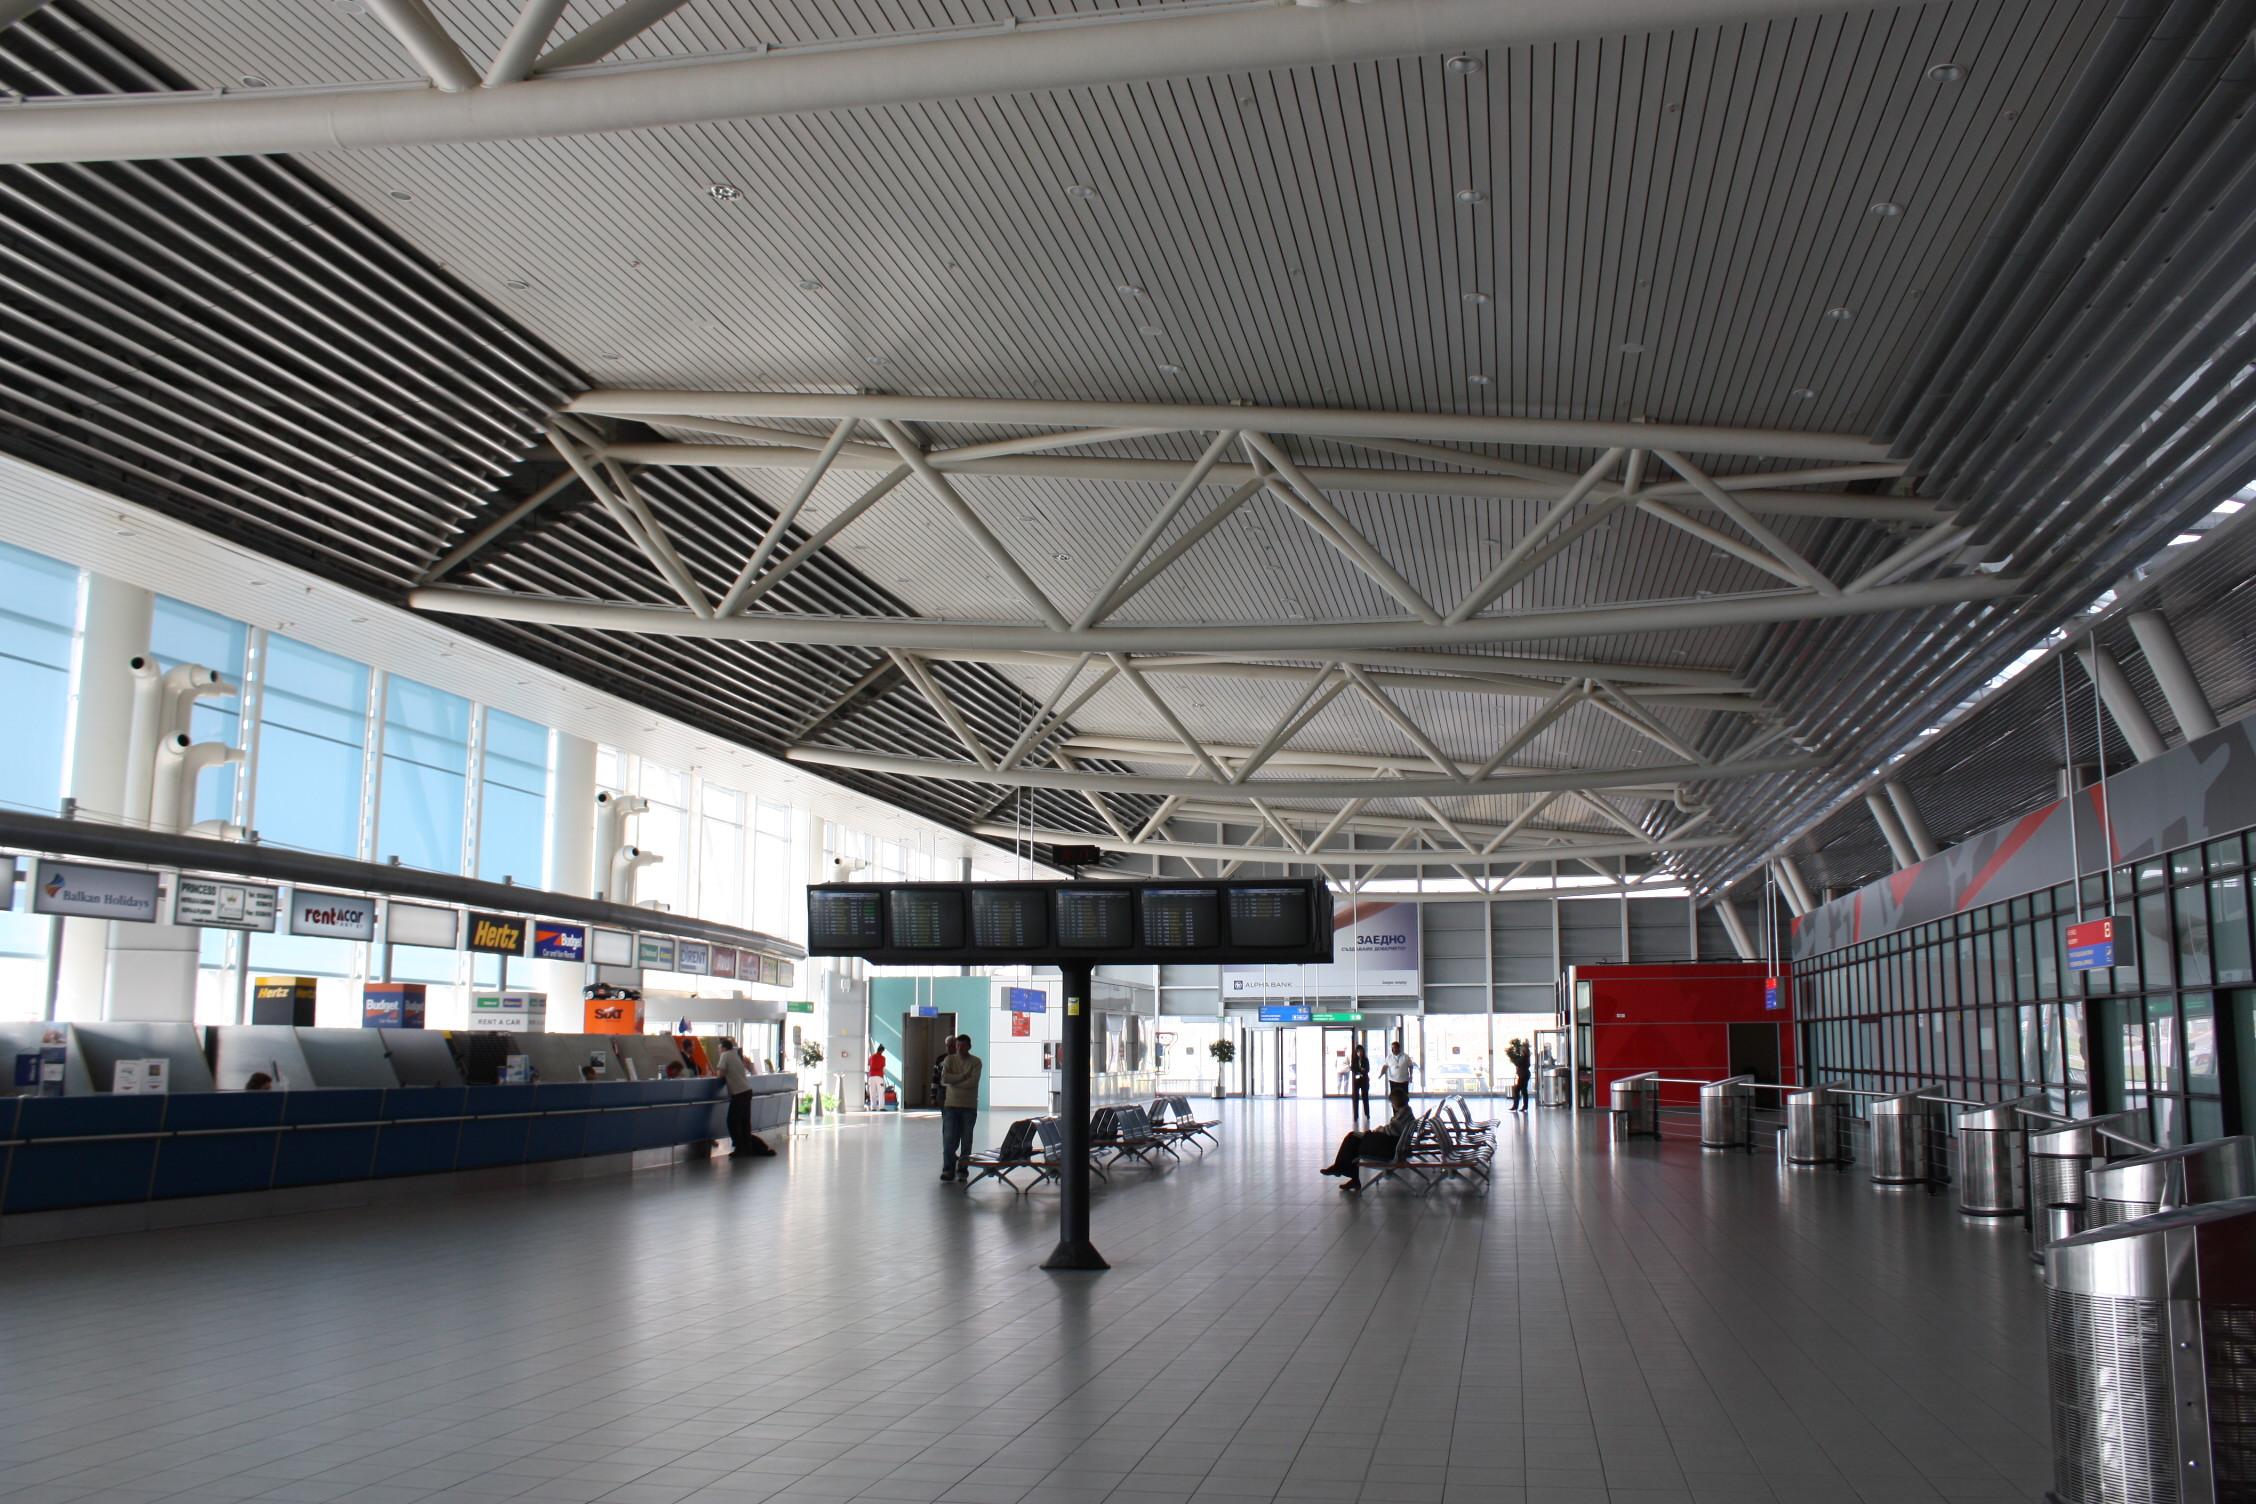 File:Inside Sofia Airport 20090409 033.JPG